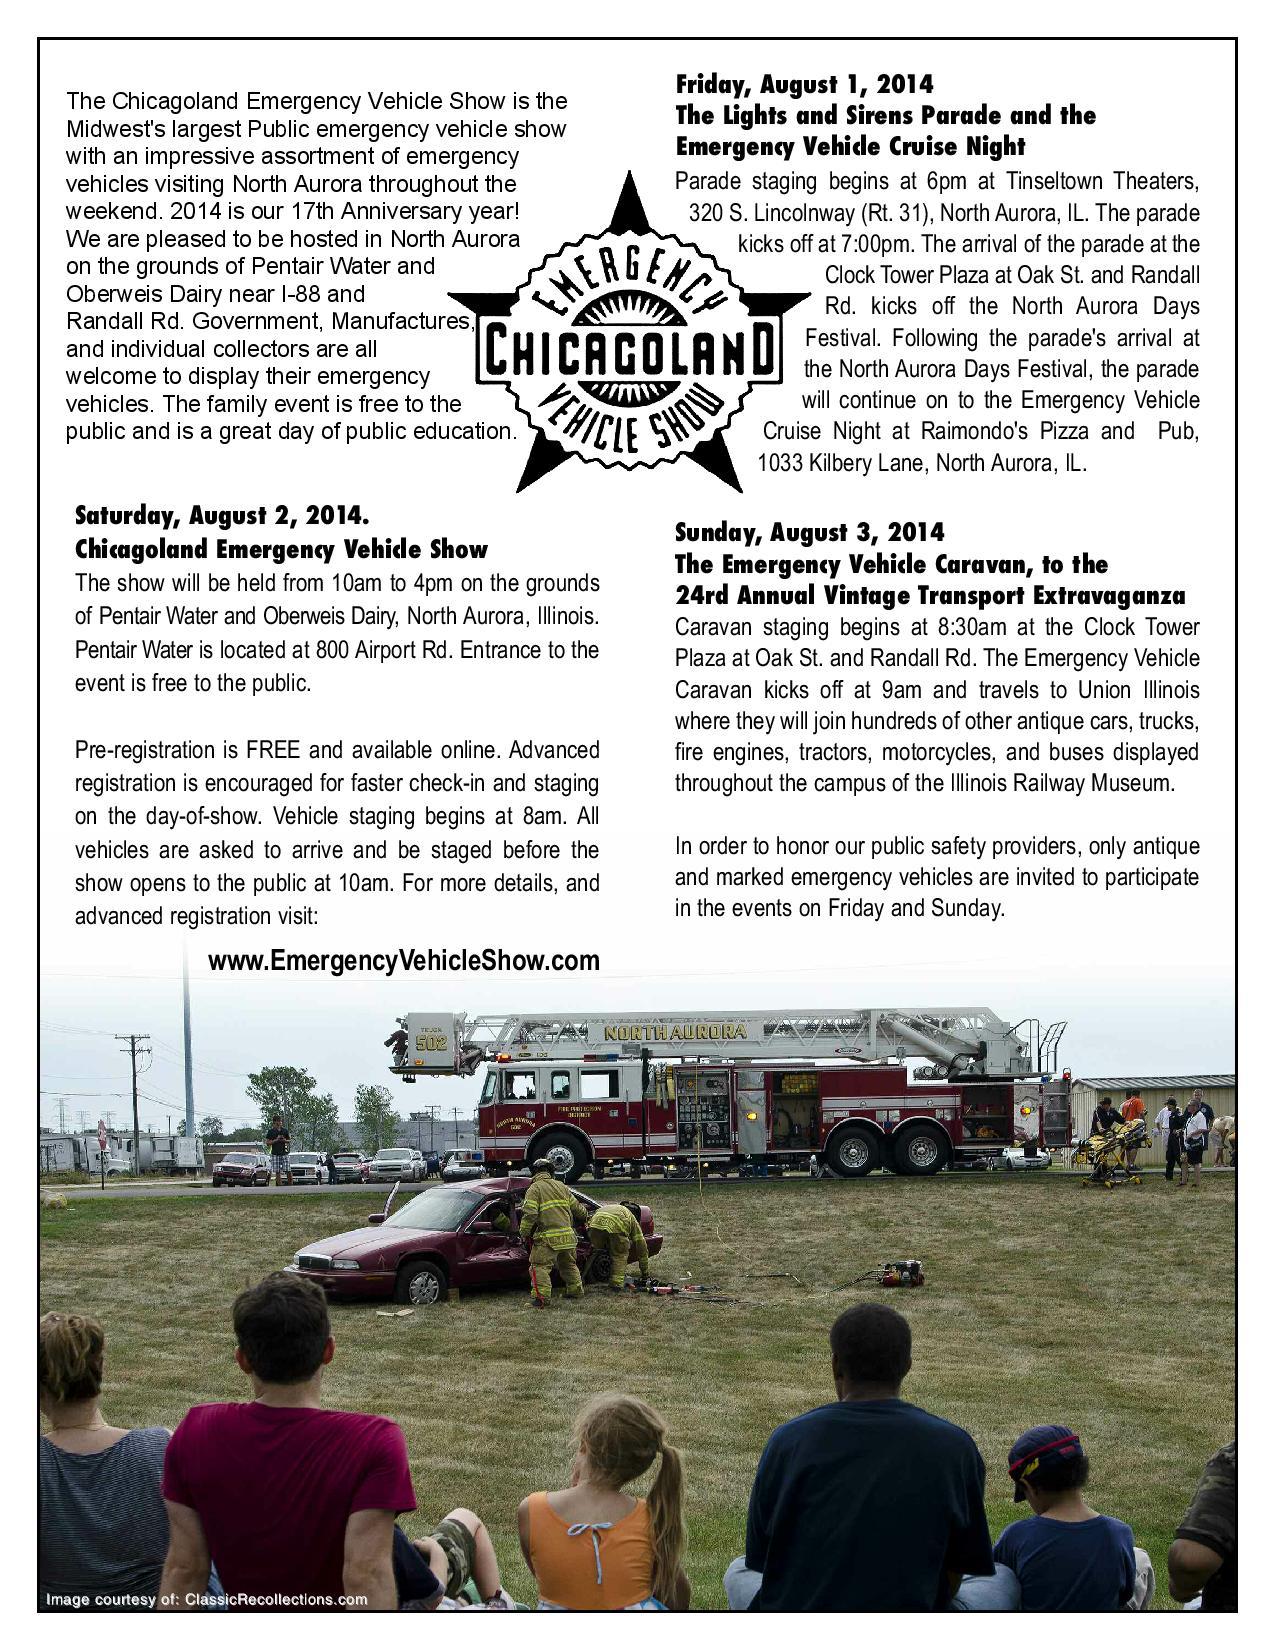 Chicagoland Emergency Vehicle Show